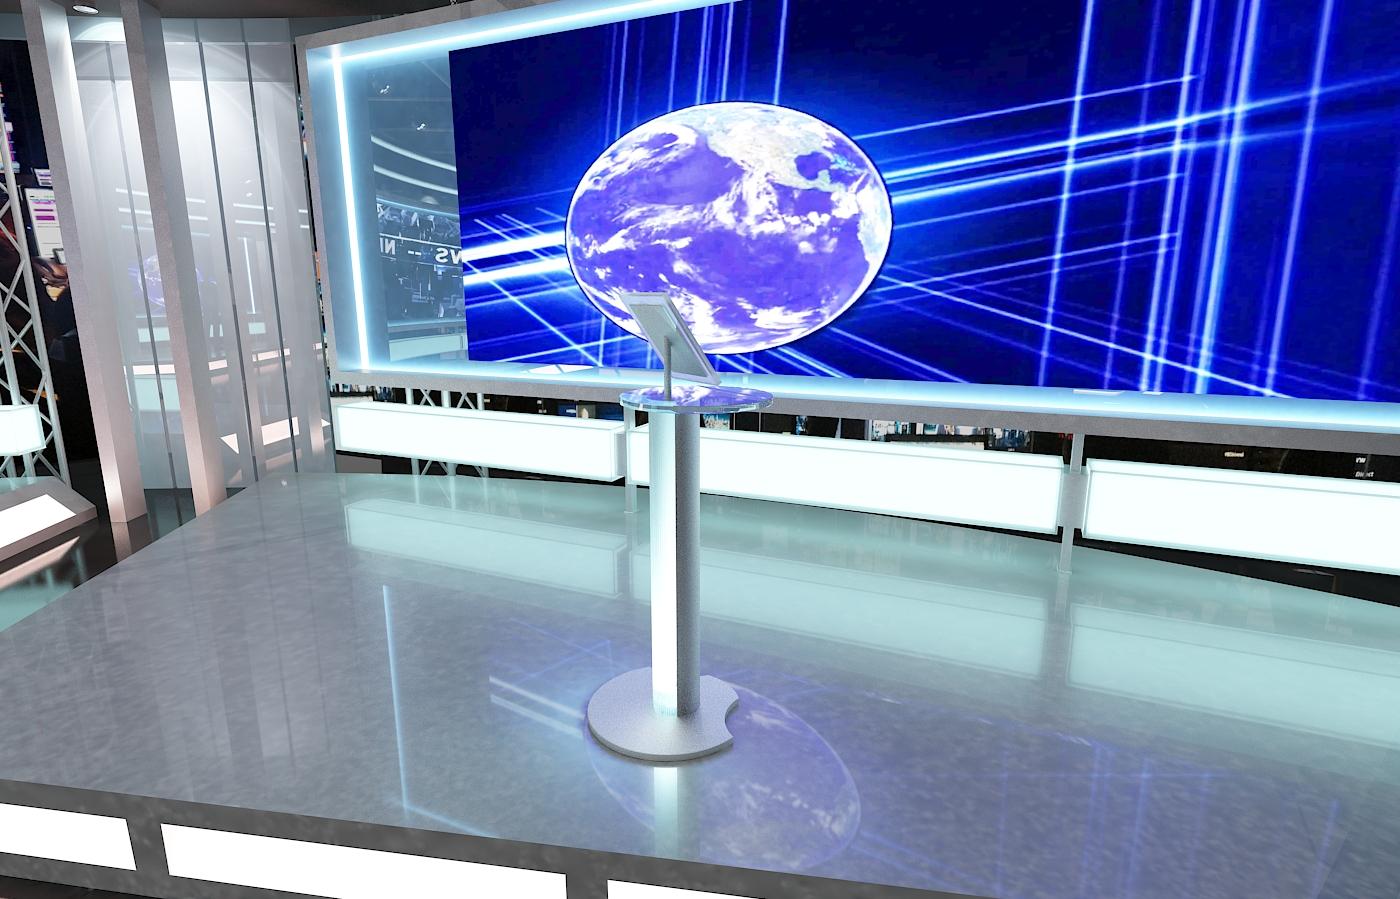 виртуал телевизийн студи цуглуулга vol 6 3d загвар max dxf dwg fbx obj 223381